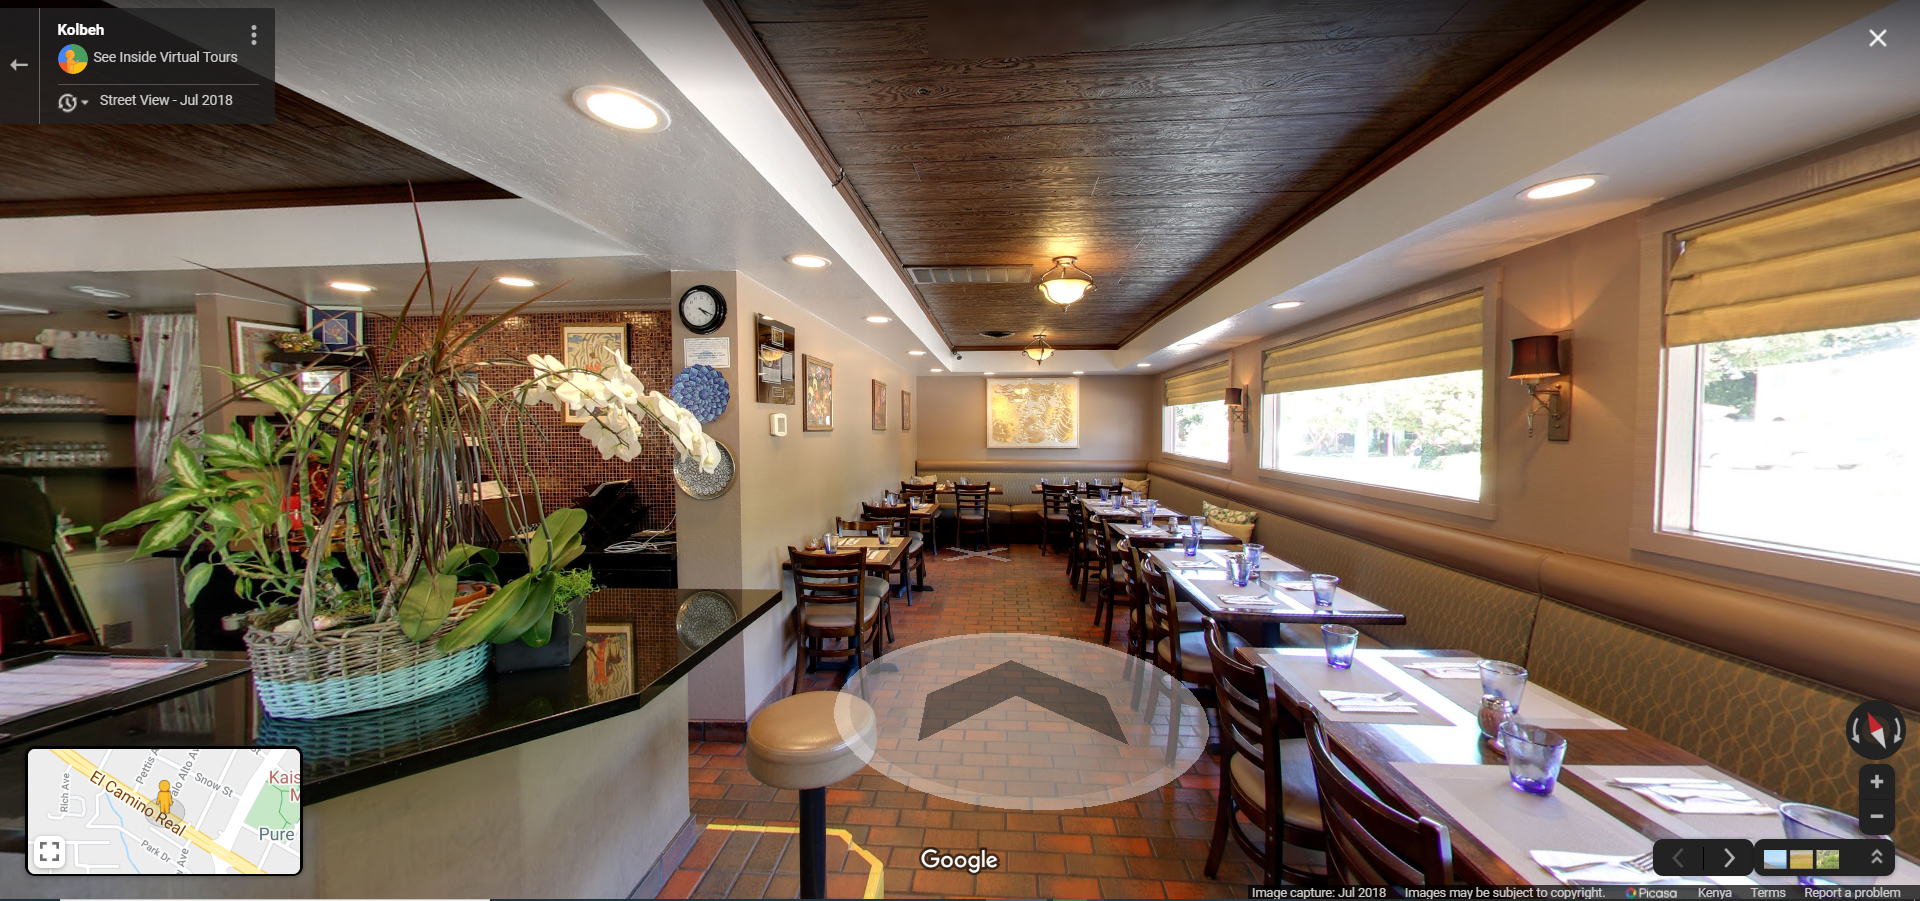 Kolbeh Restaurant  Mountain View